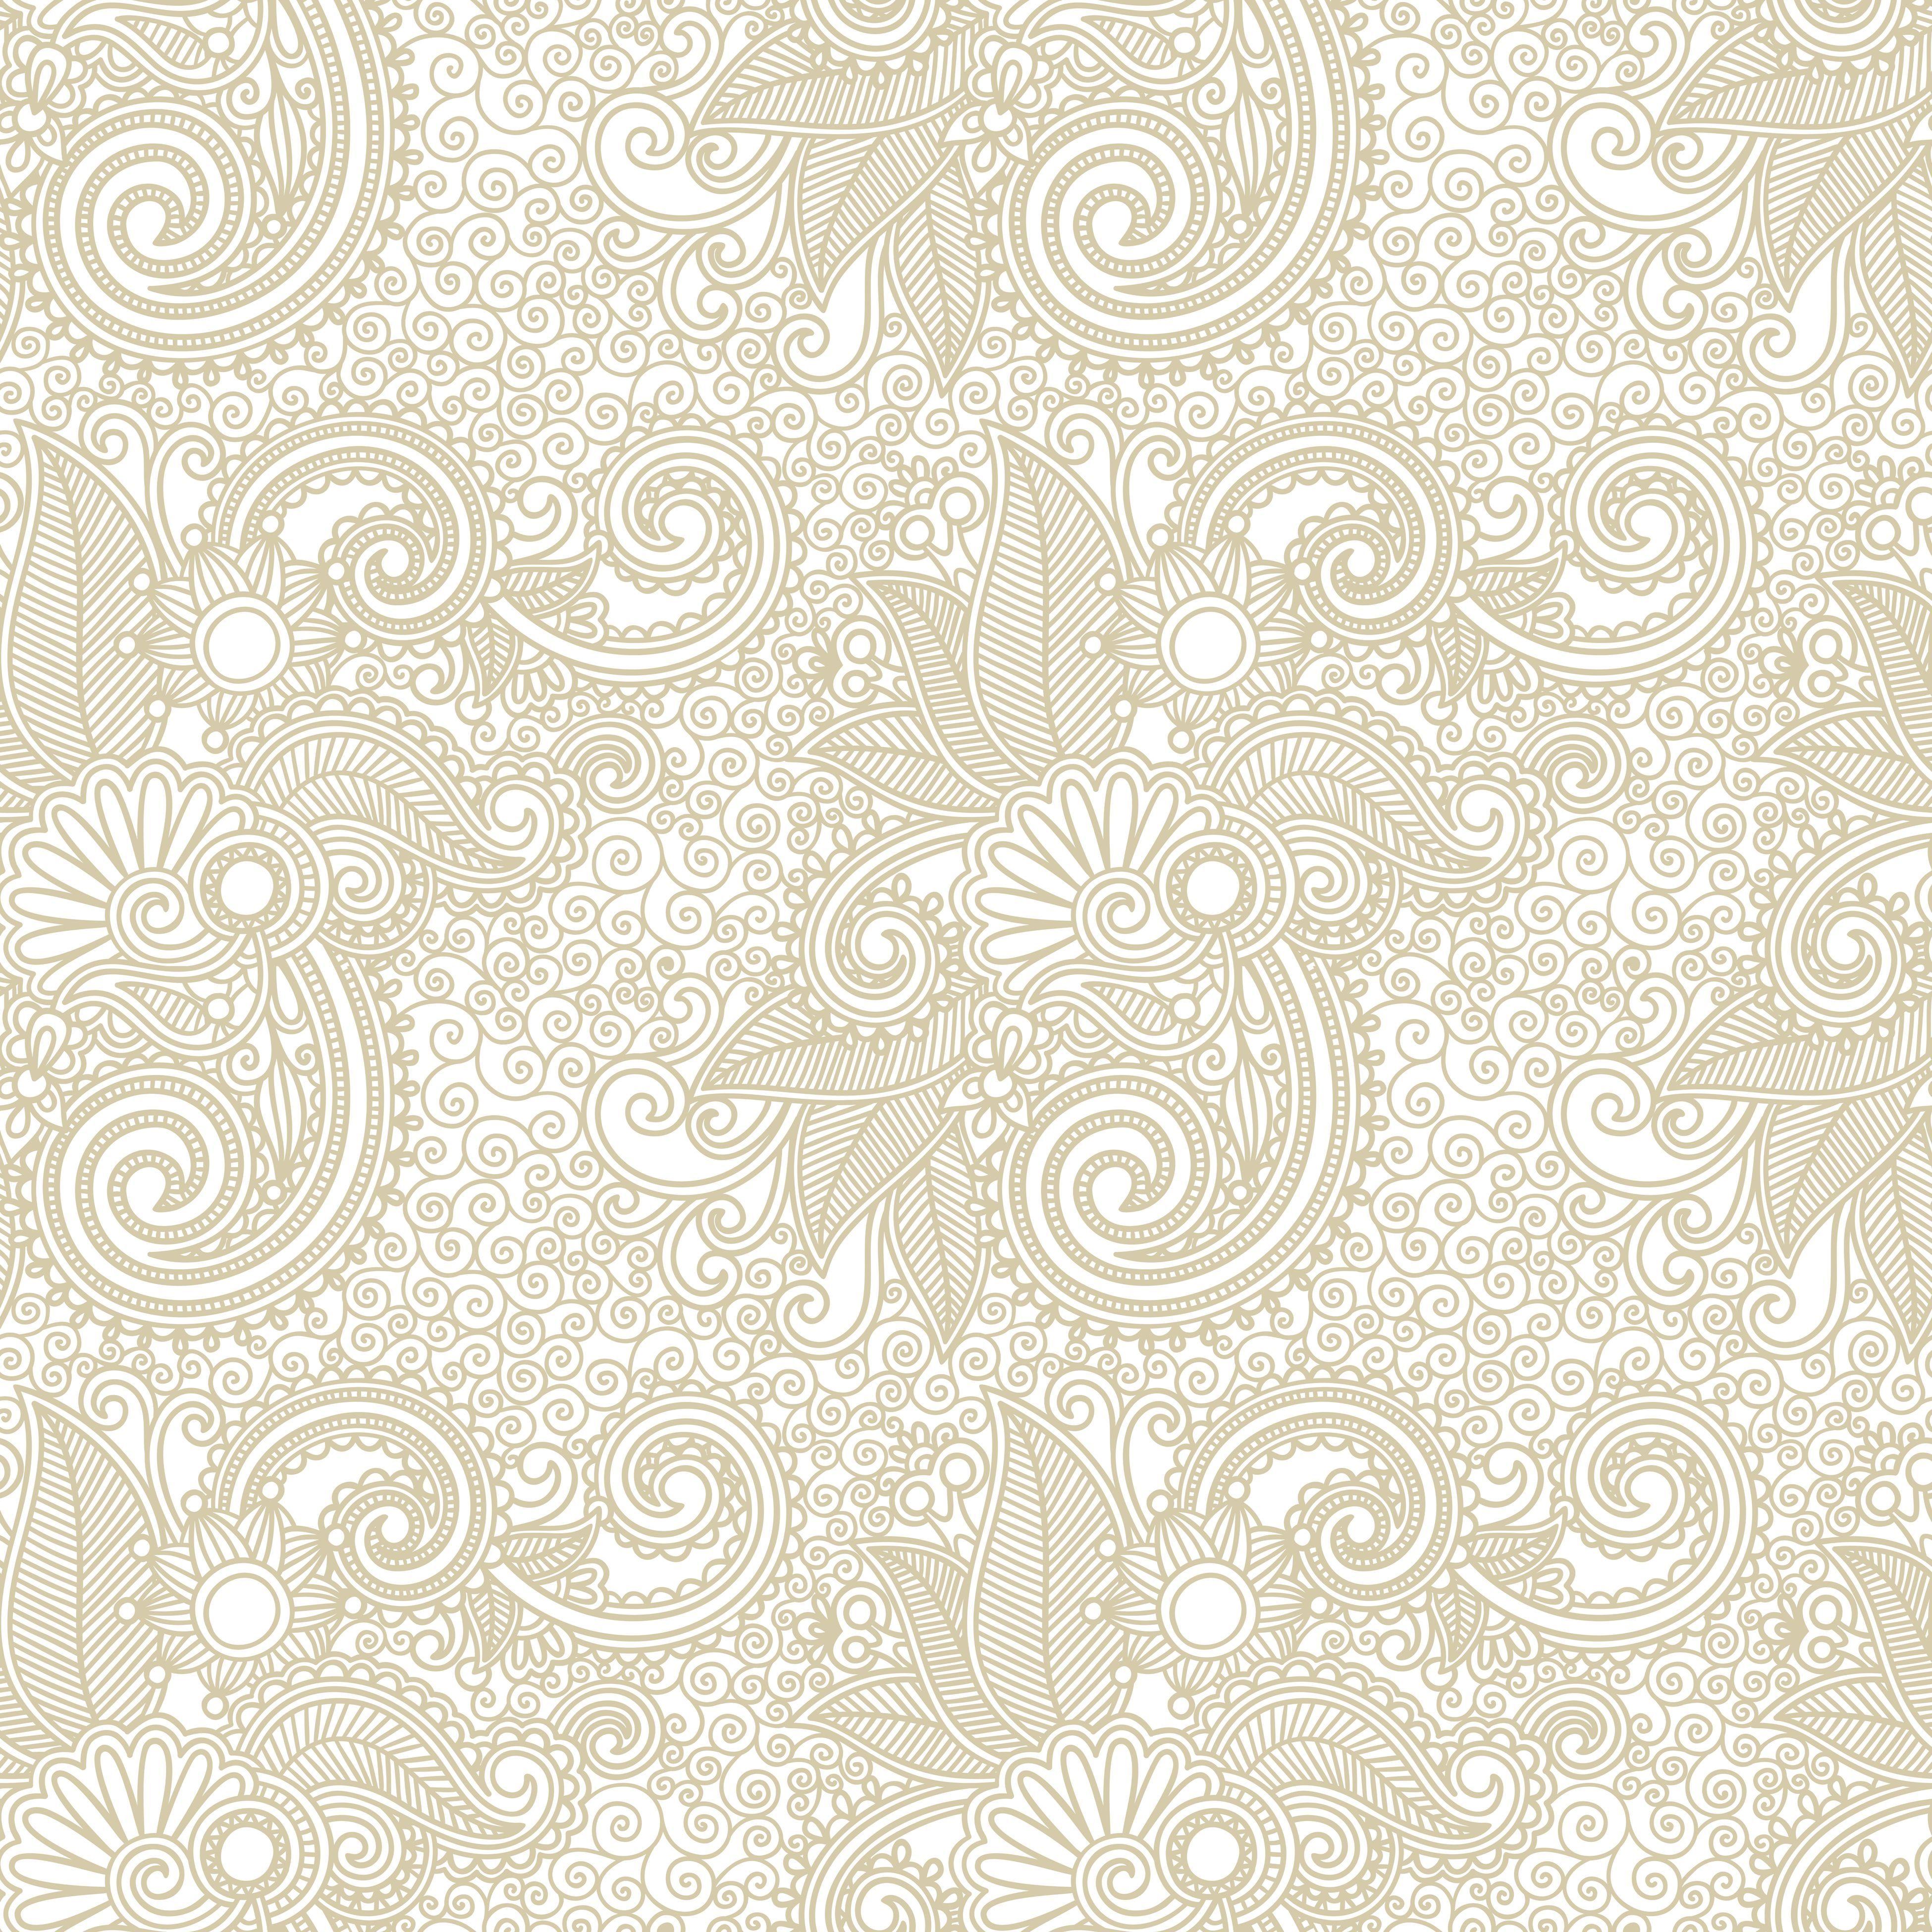 lace swirls wallpaper